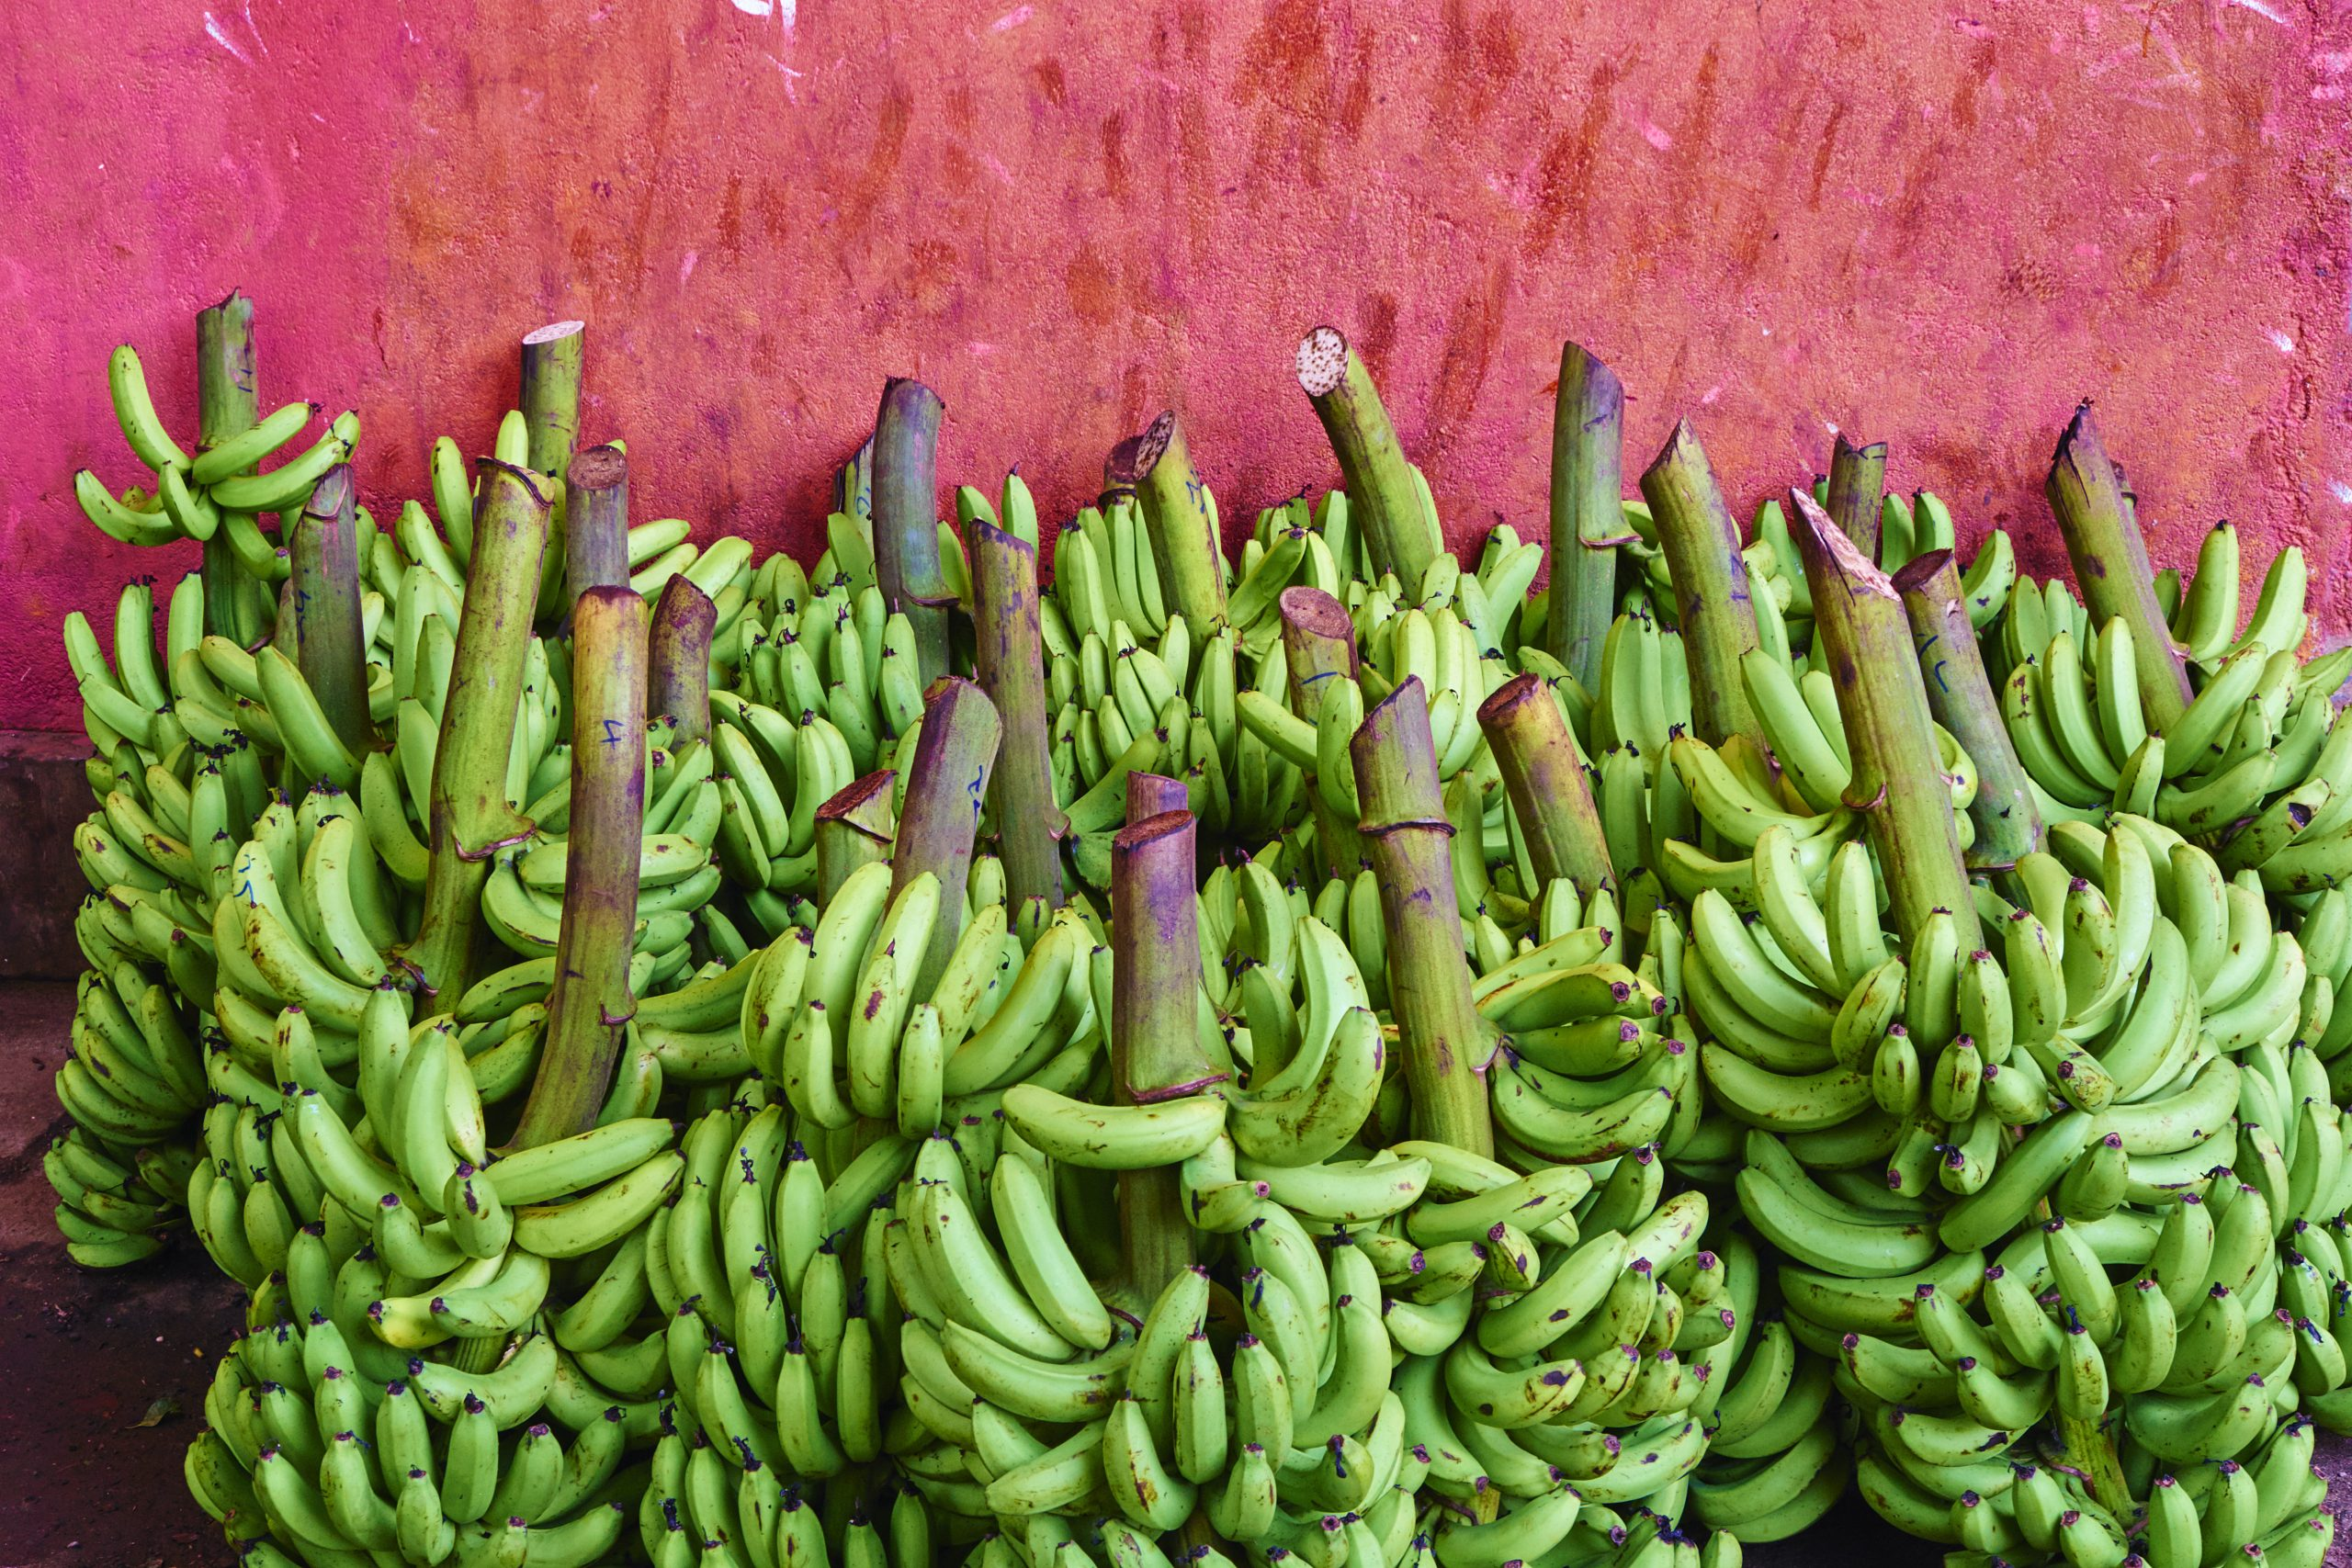 Sri Lanka, Dambulla, market